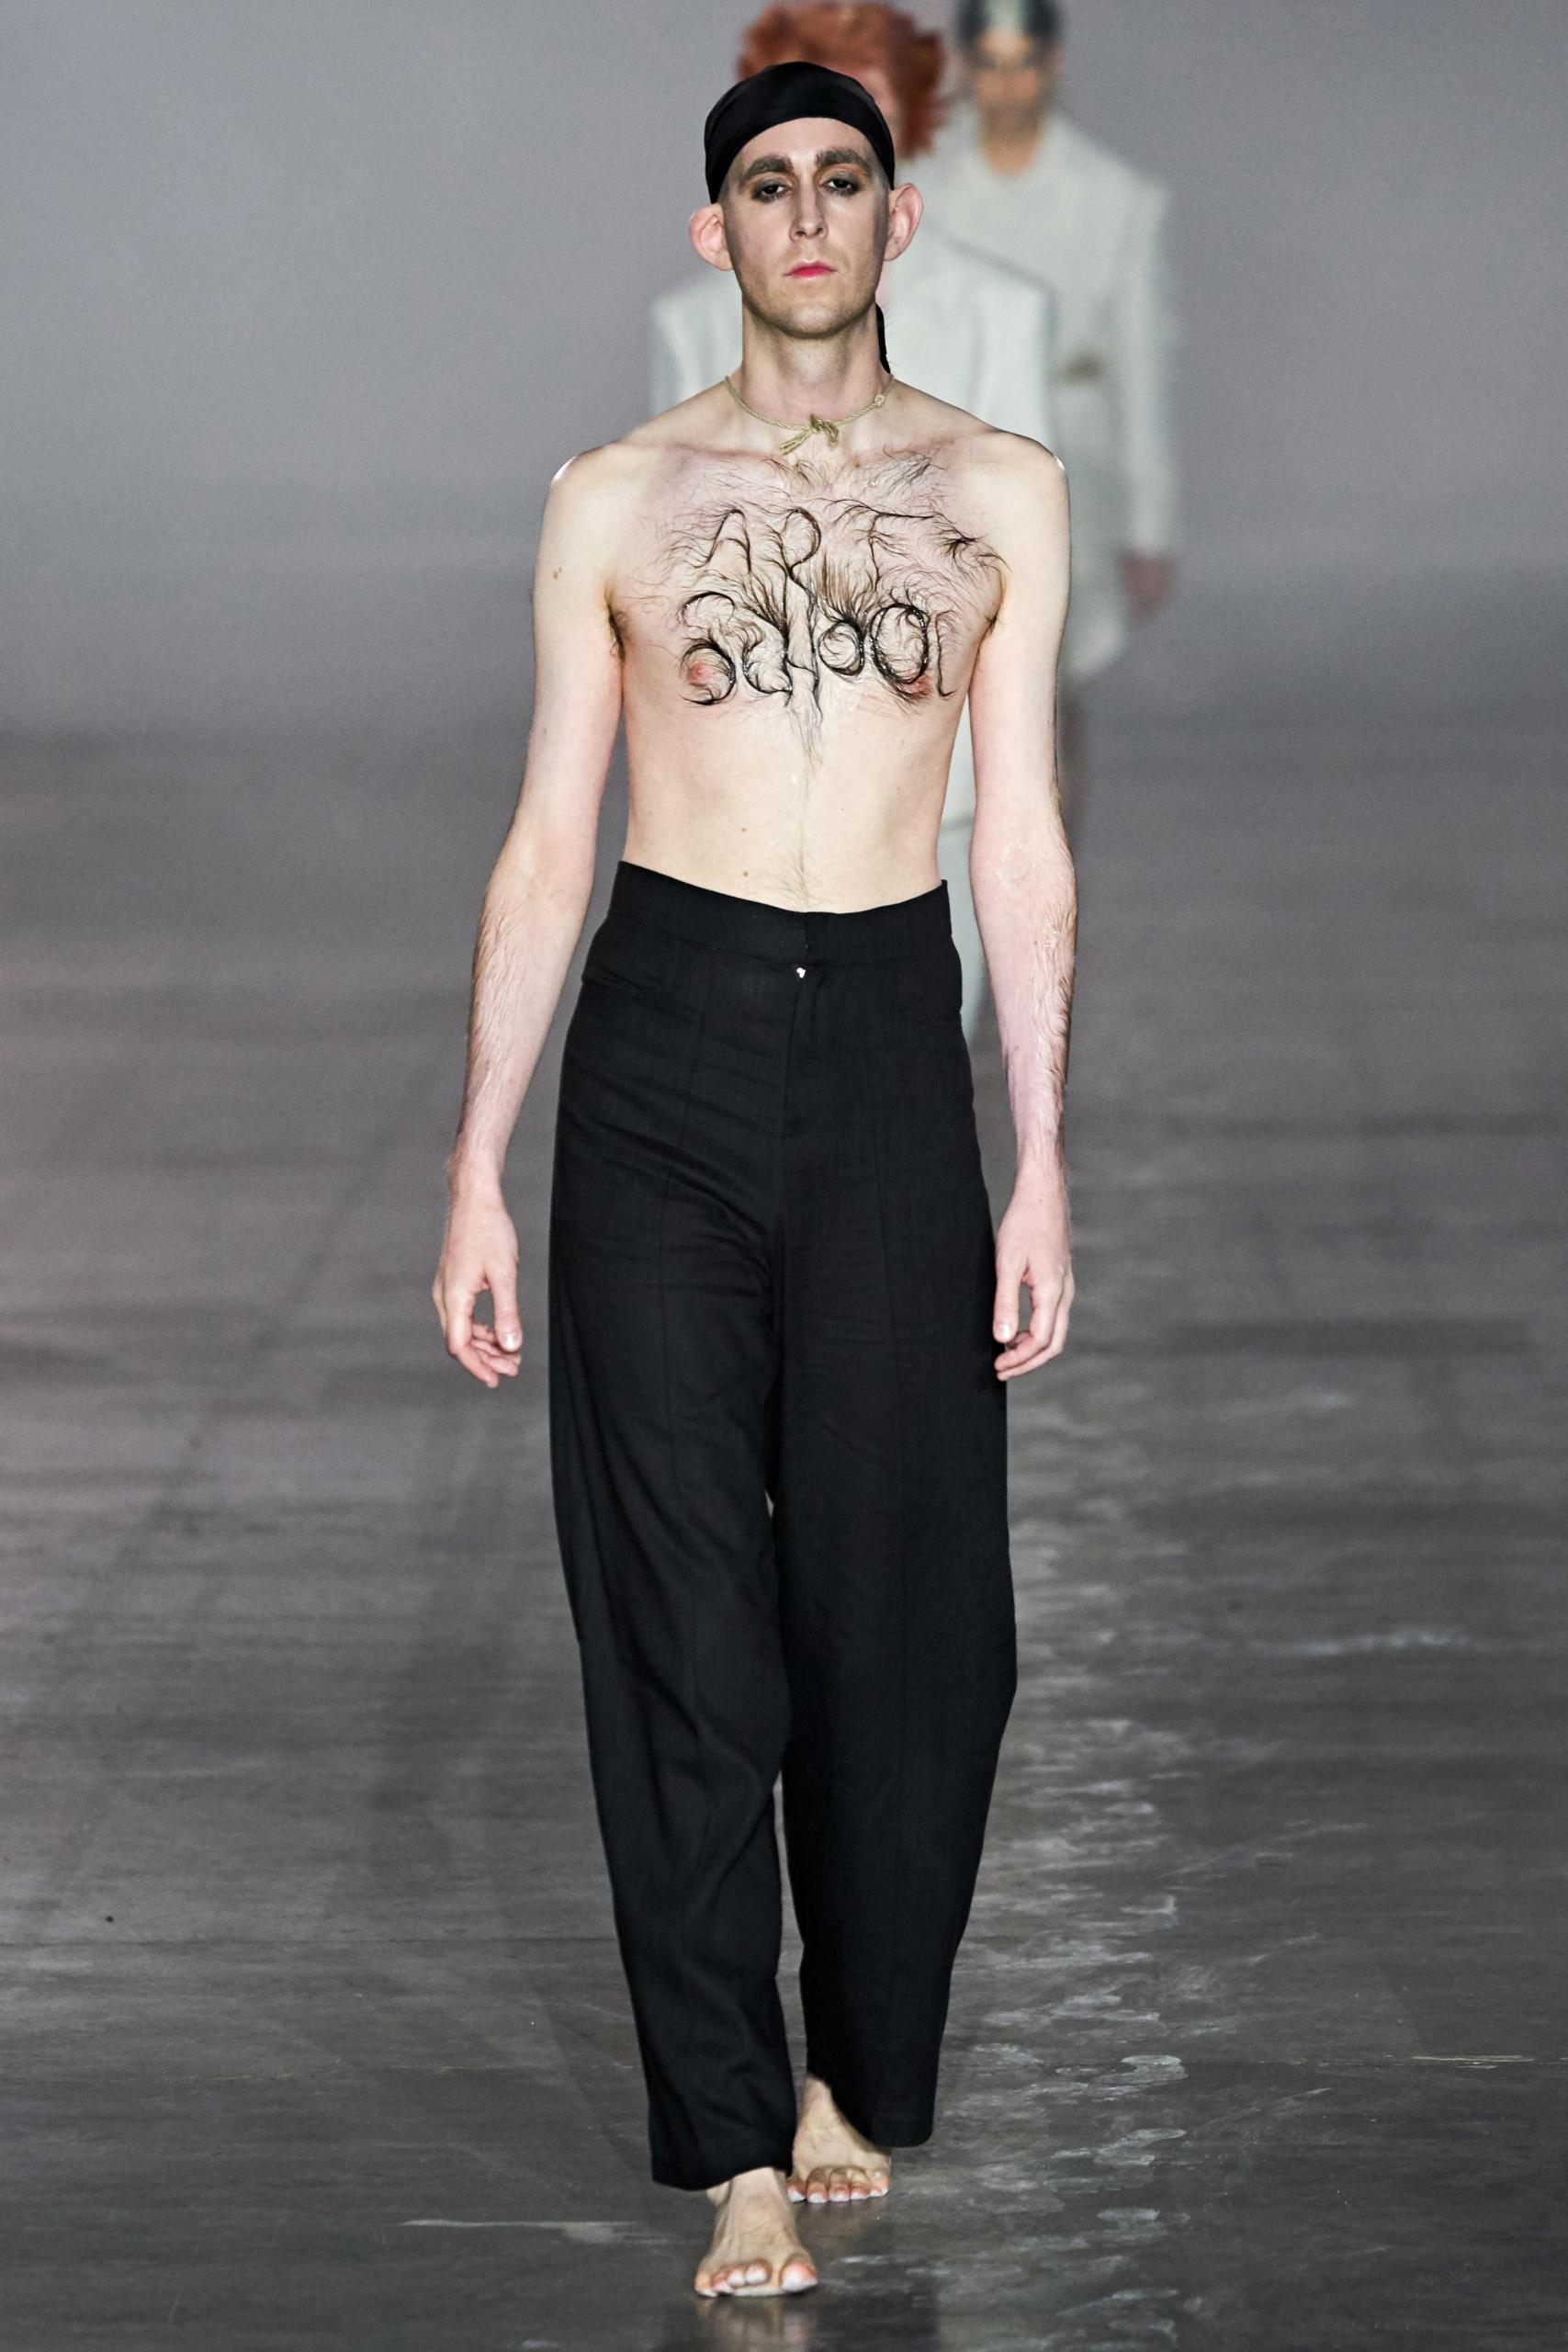 London Fashion Week: Art School creó arte con vello corporal para su colección AW 2020